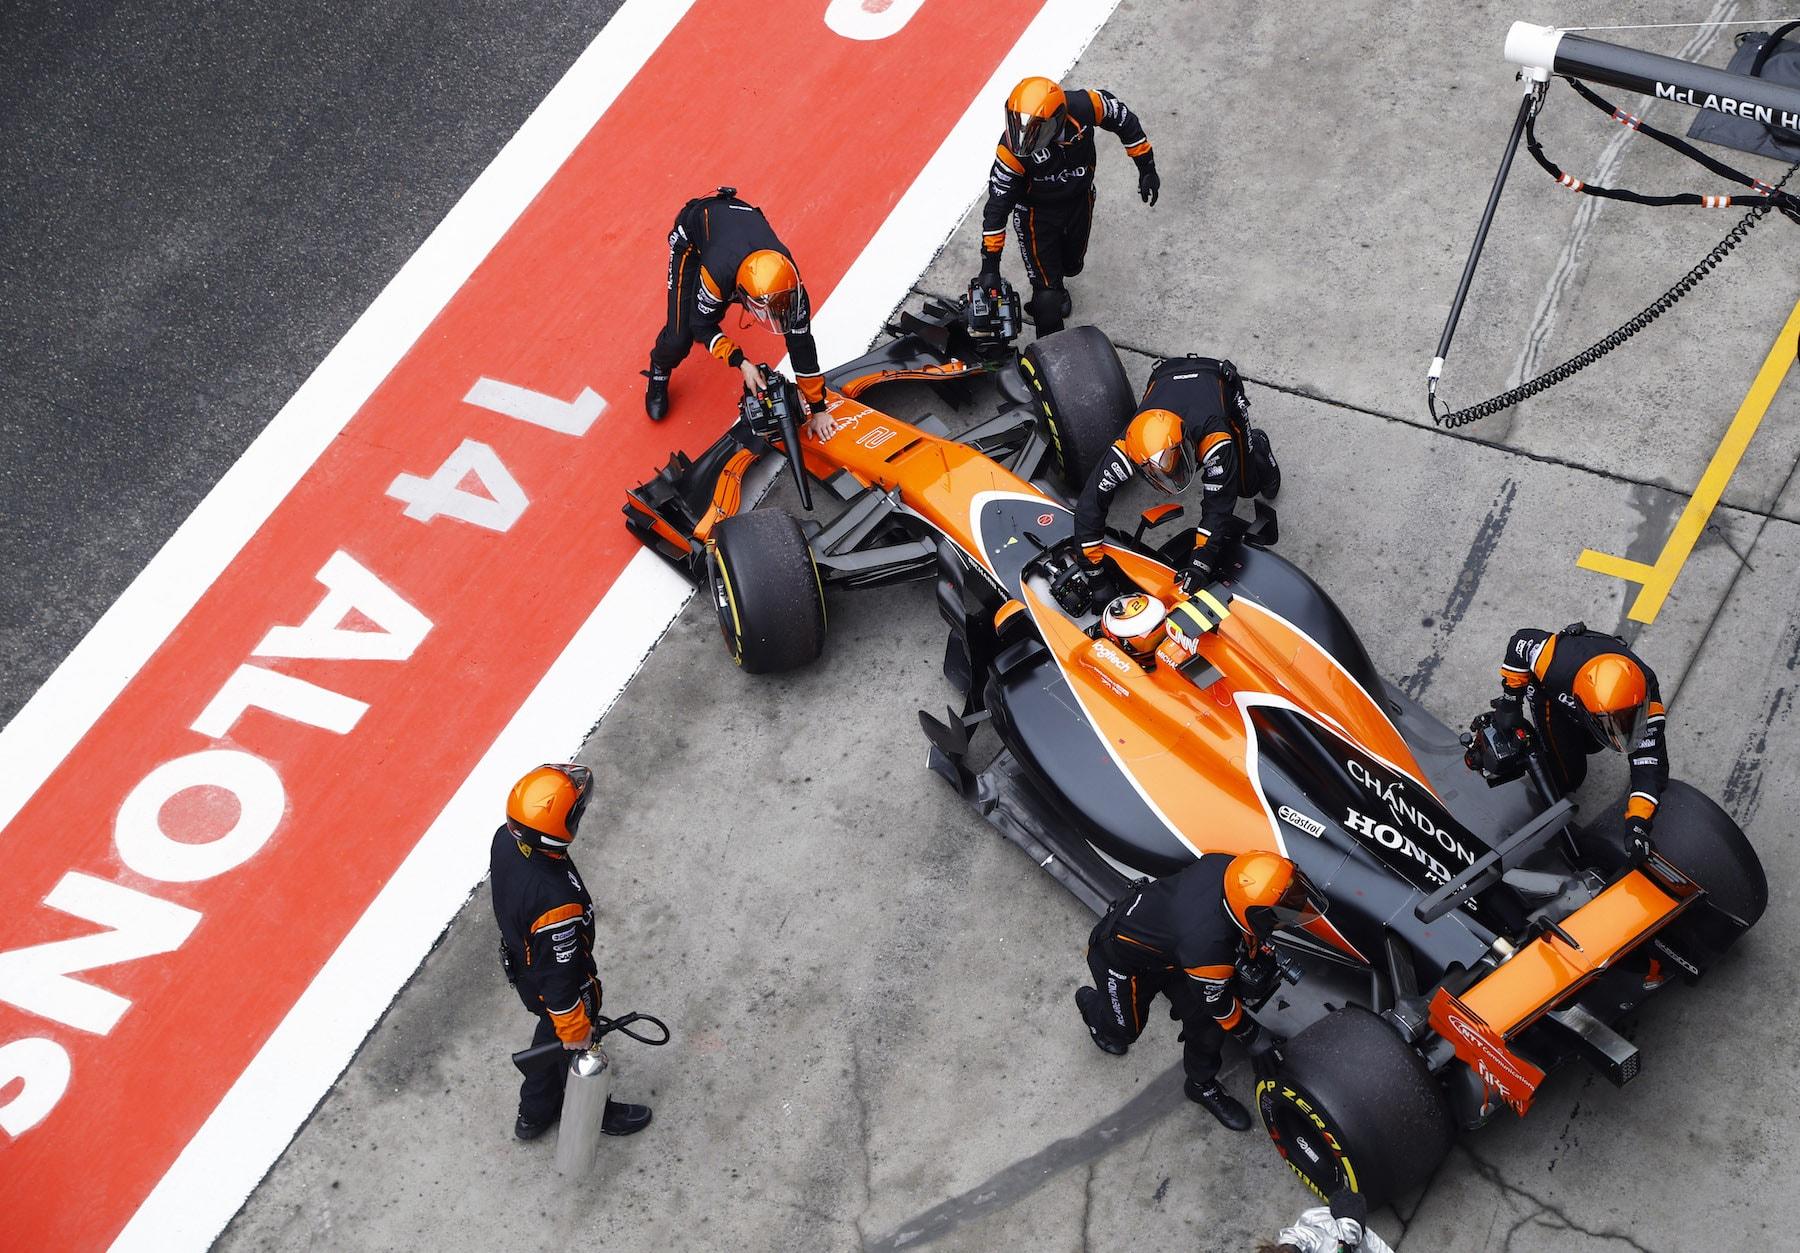 H 2017 Stoffel Vandoorne | McLaren MCL32 | 2017 Chinese GP 1 copy.jpg